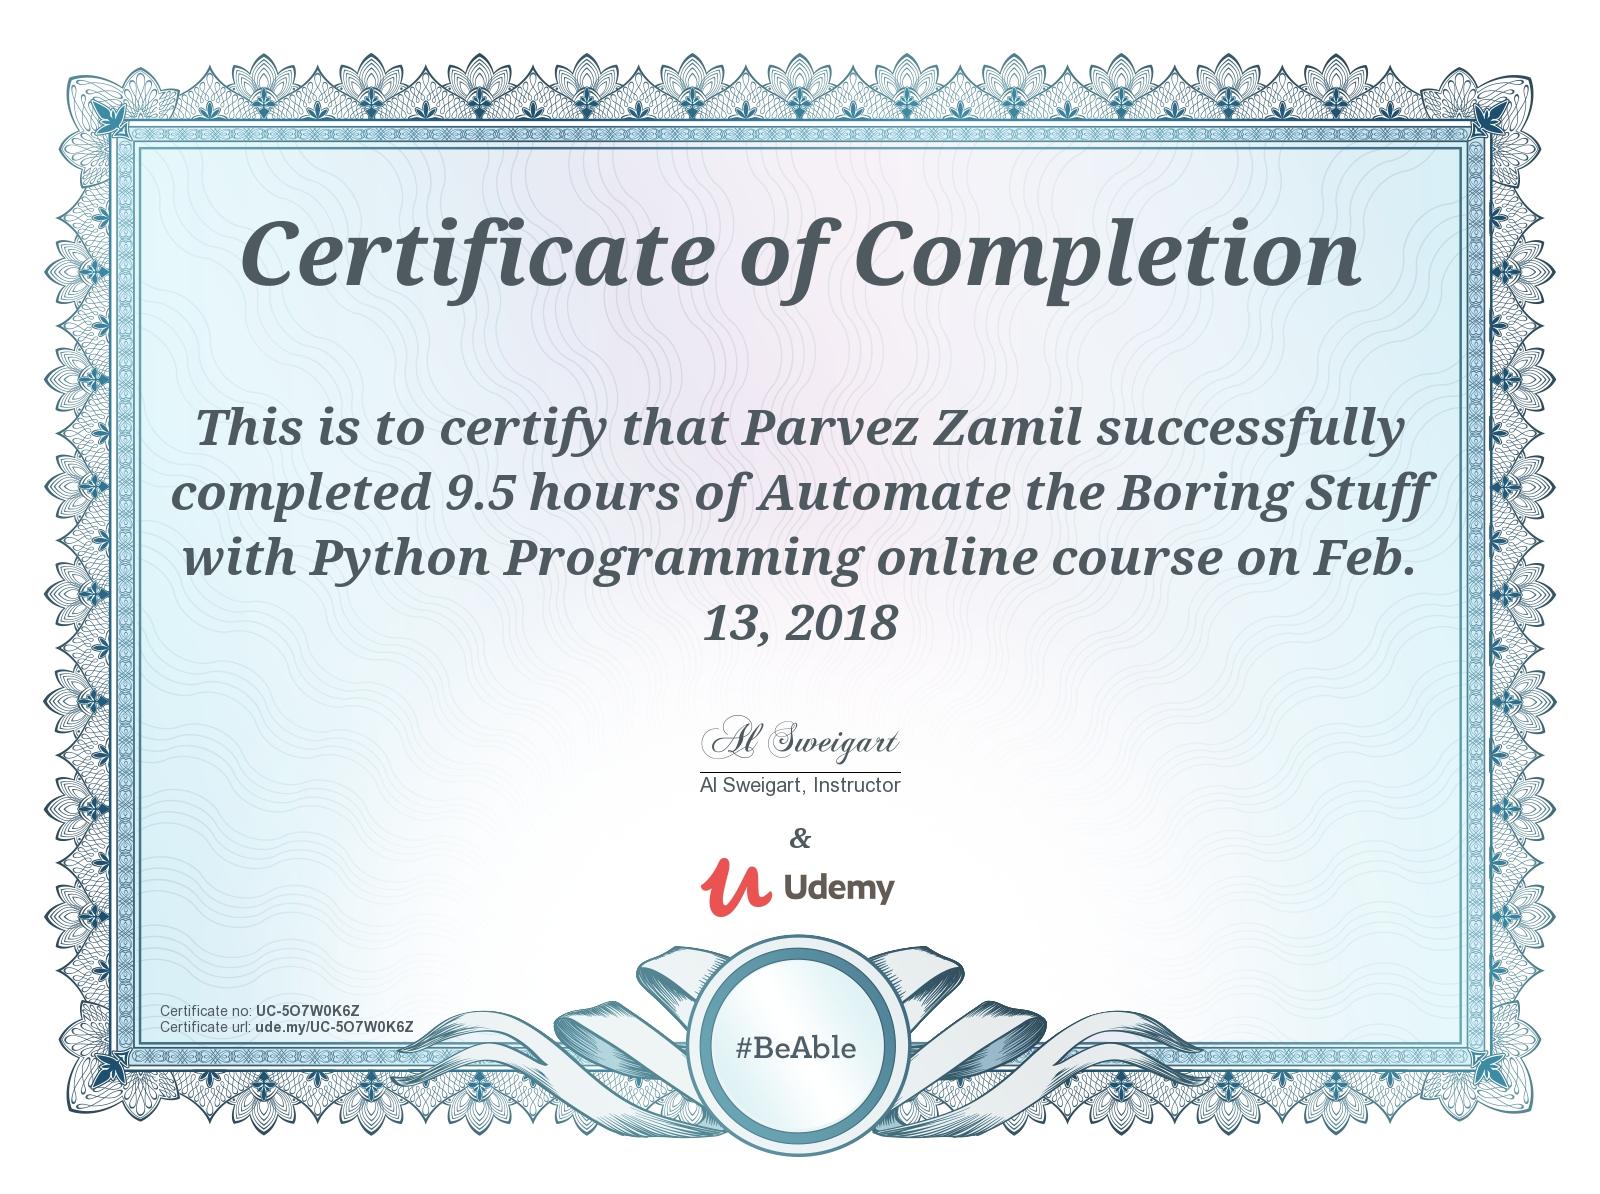 Github Zparvez2zautomate The Boring Stuff With Python Programming